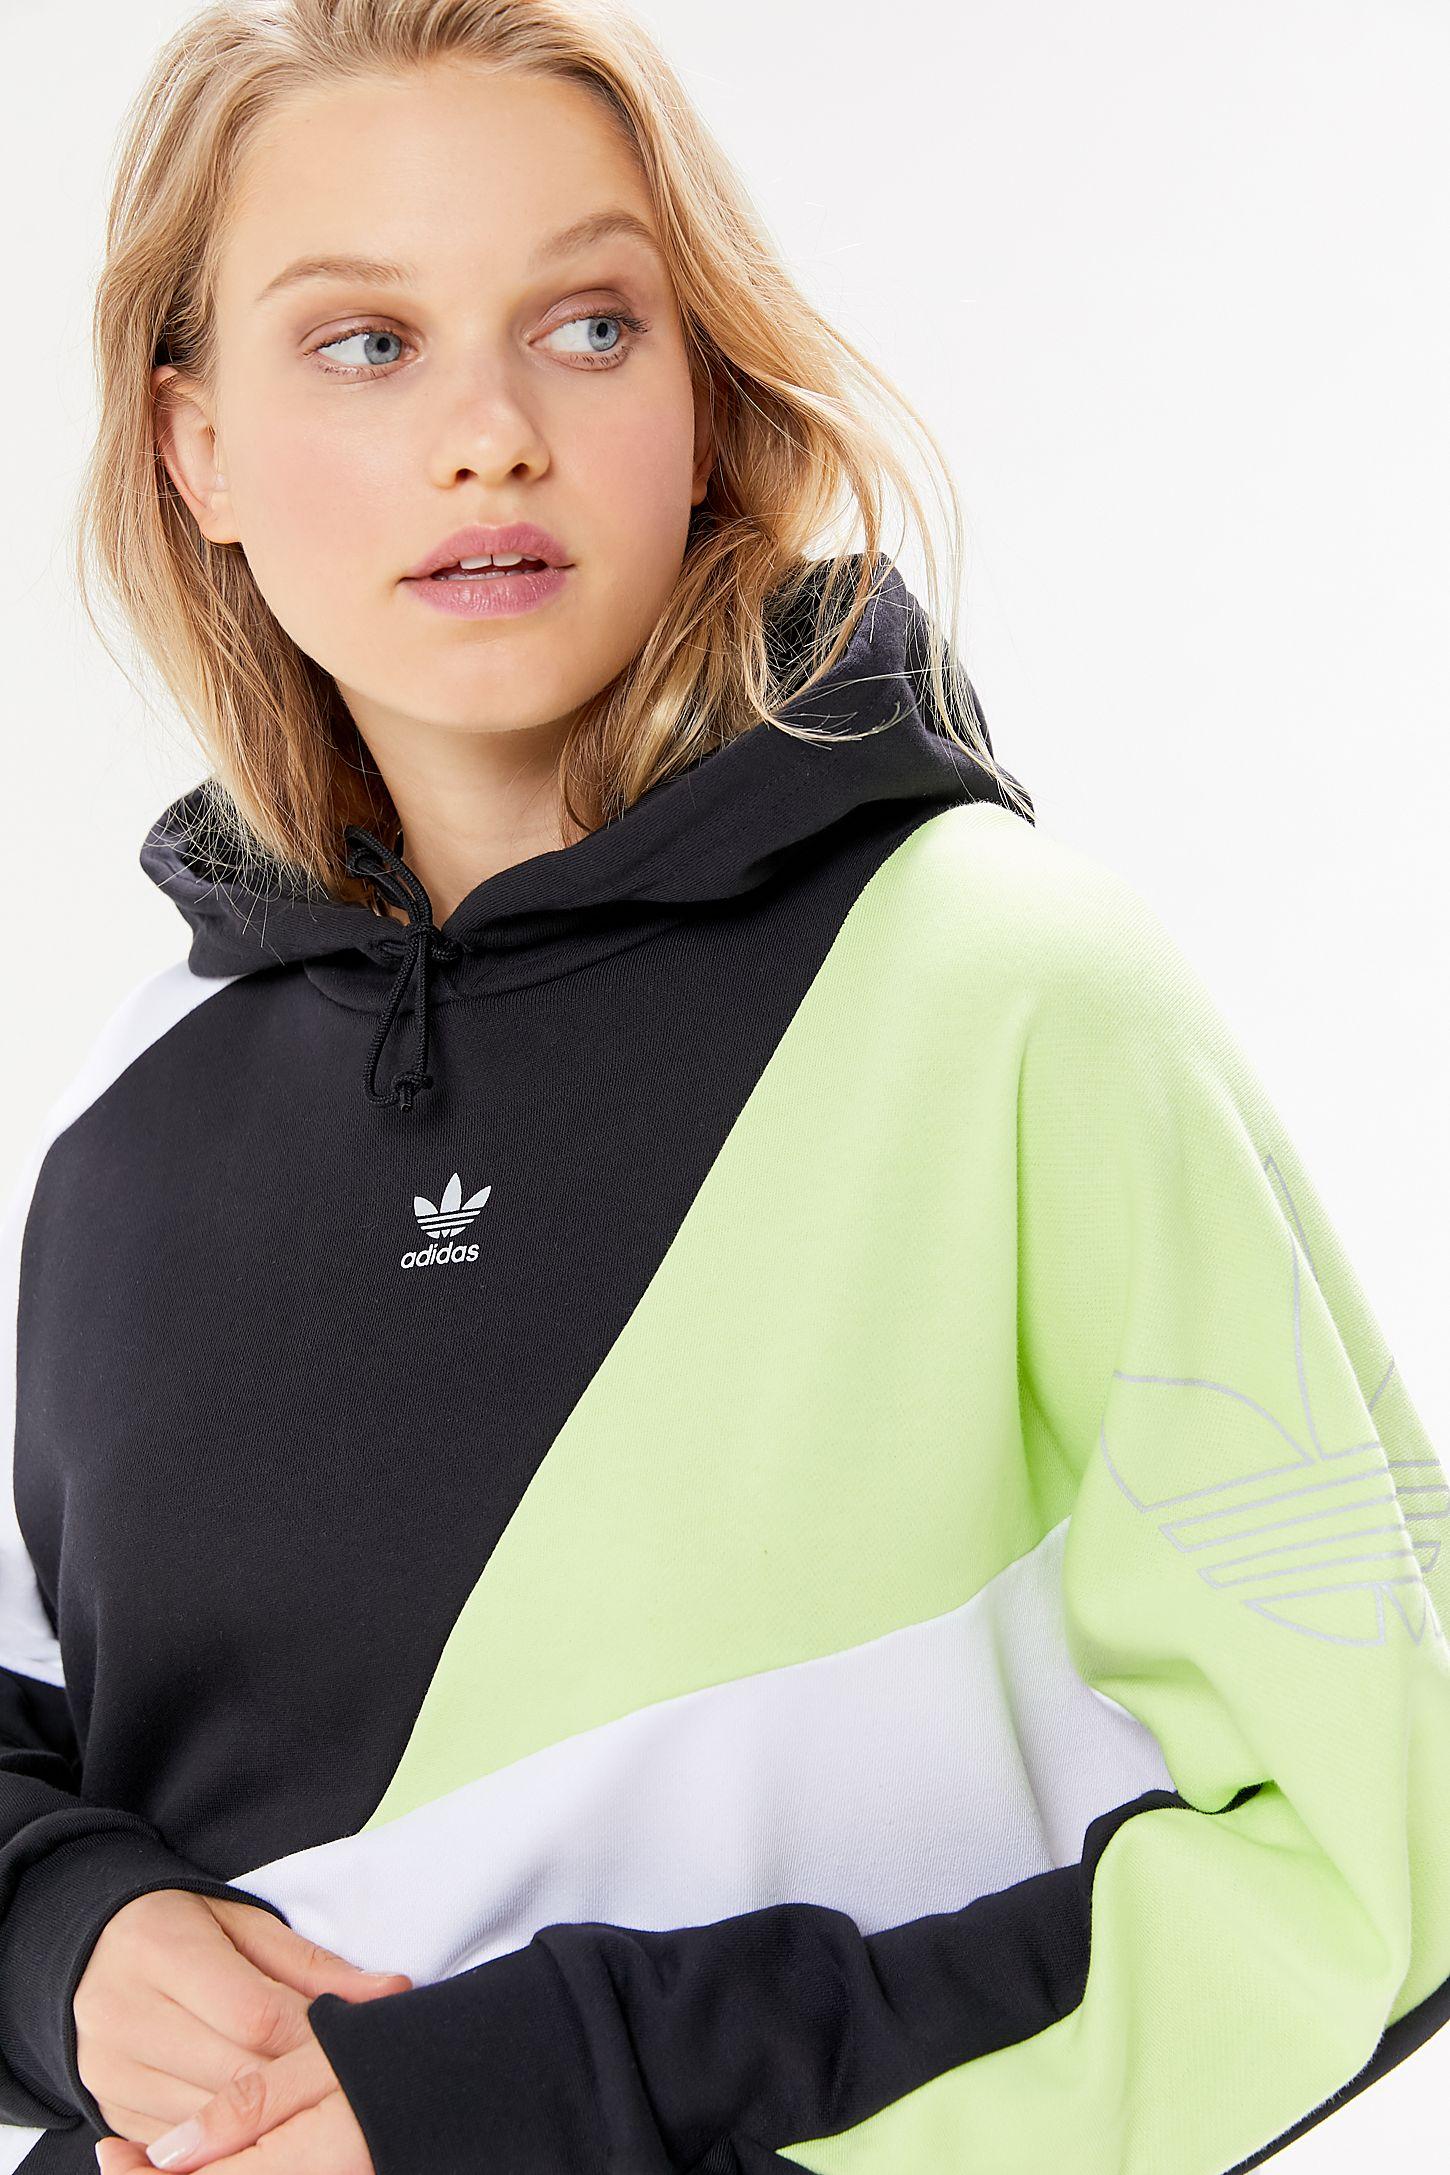 Adidas color block sweatshirt Sz. Lrg